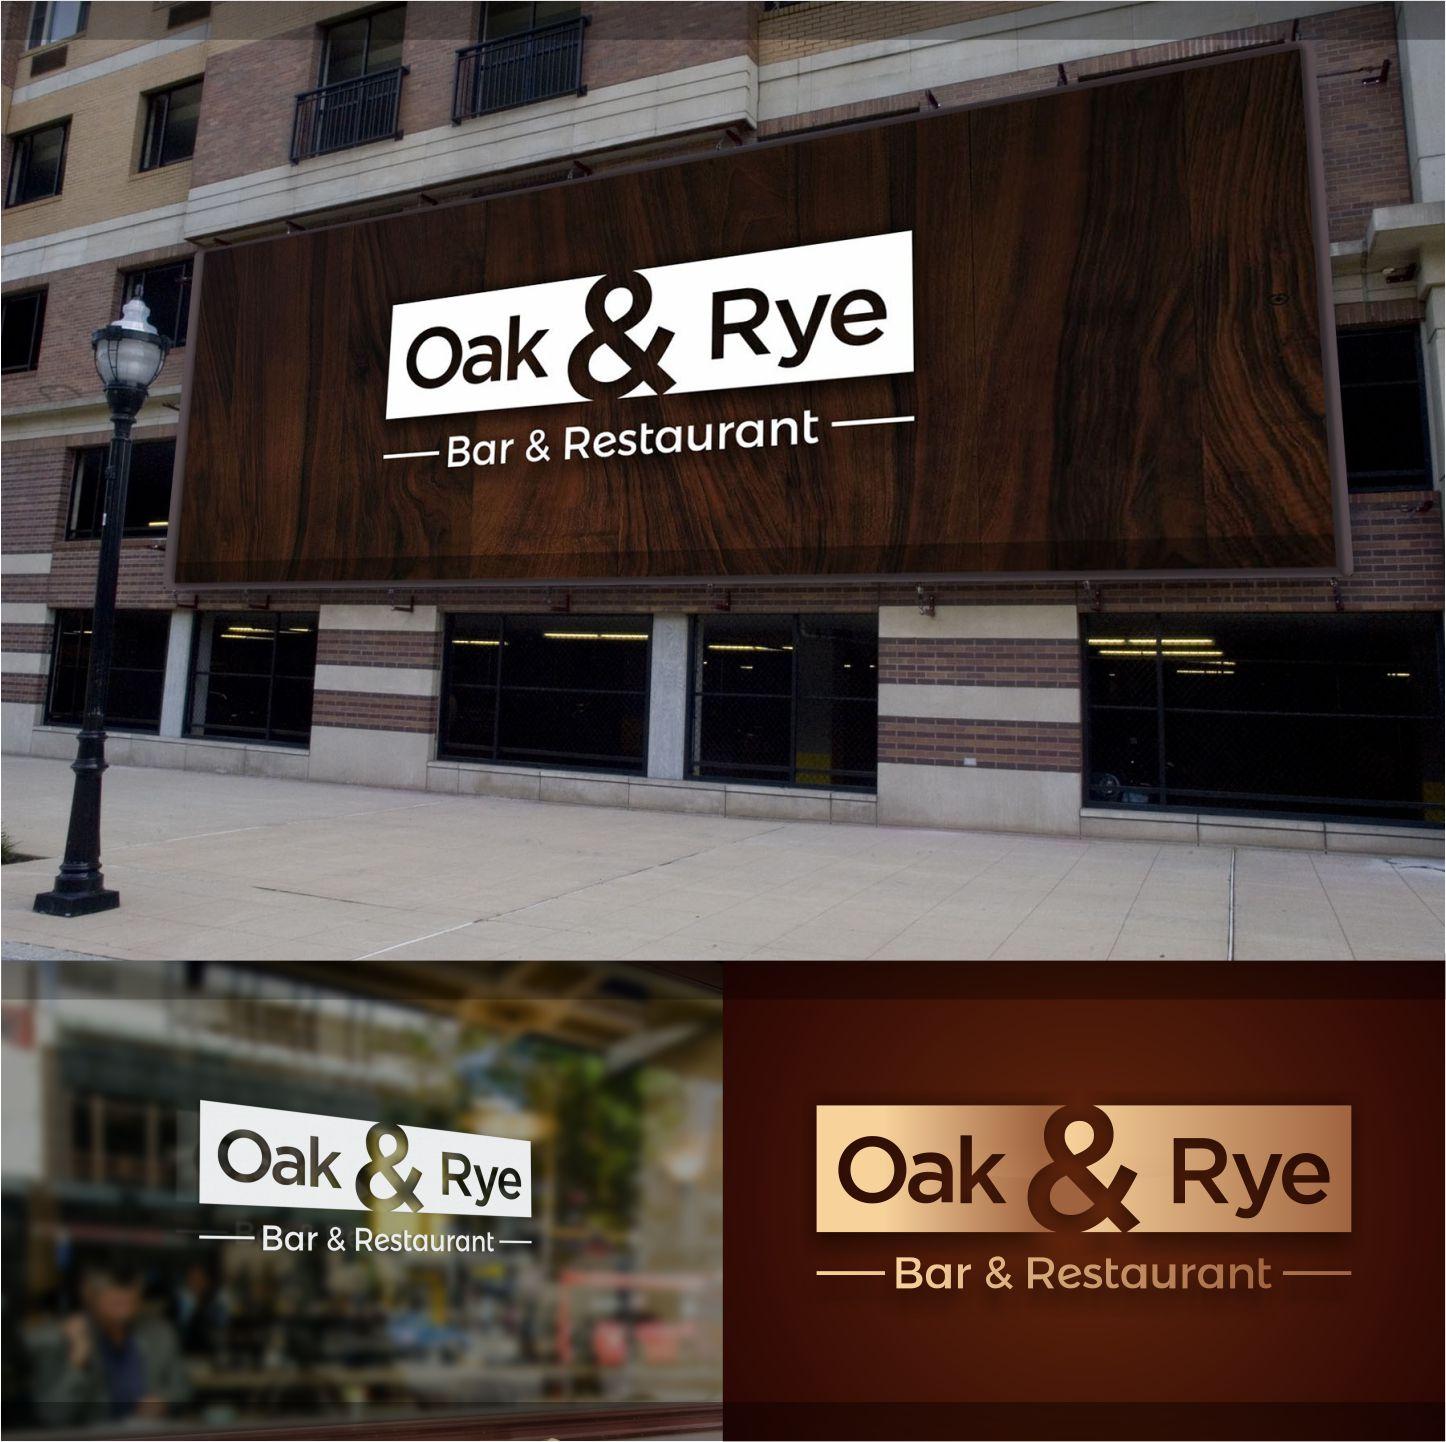 Bold Modern Restaurant Logo Design For Oak Rye Or Oak And Rye By Graphic Media Design 12212890